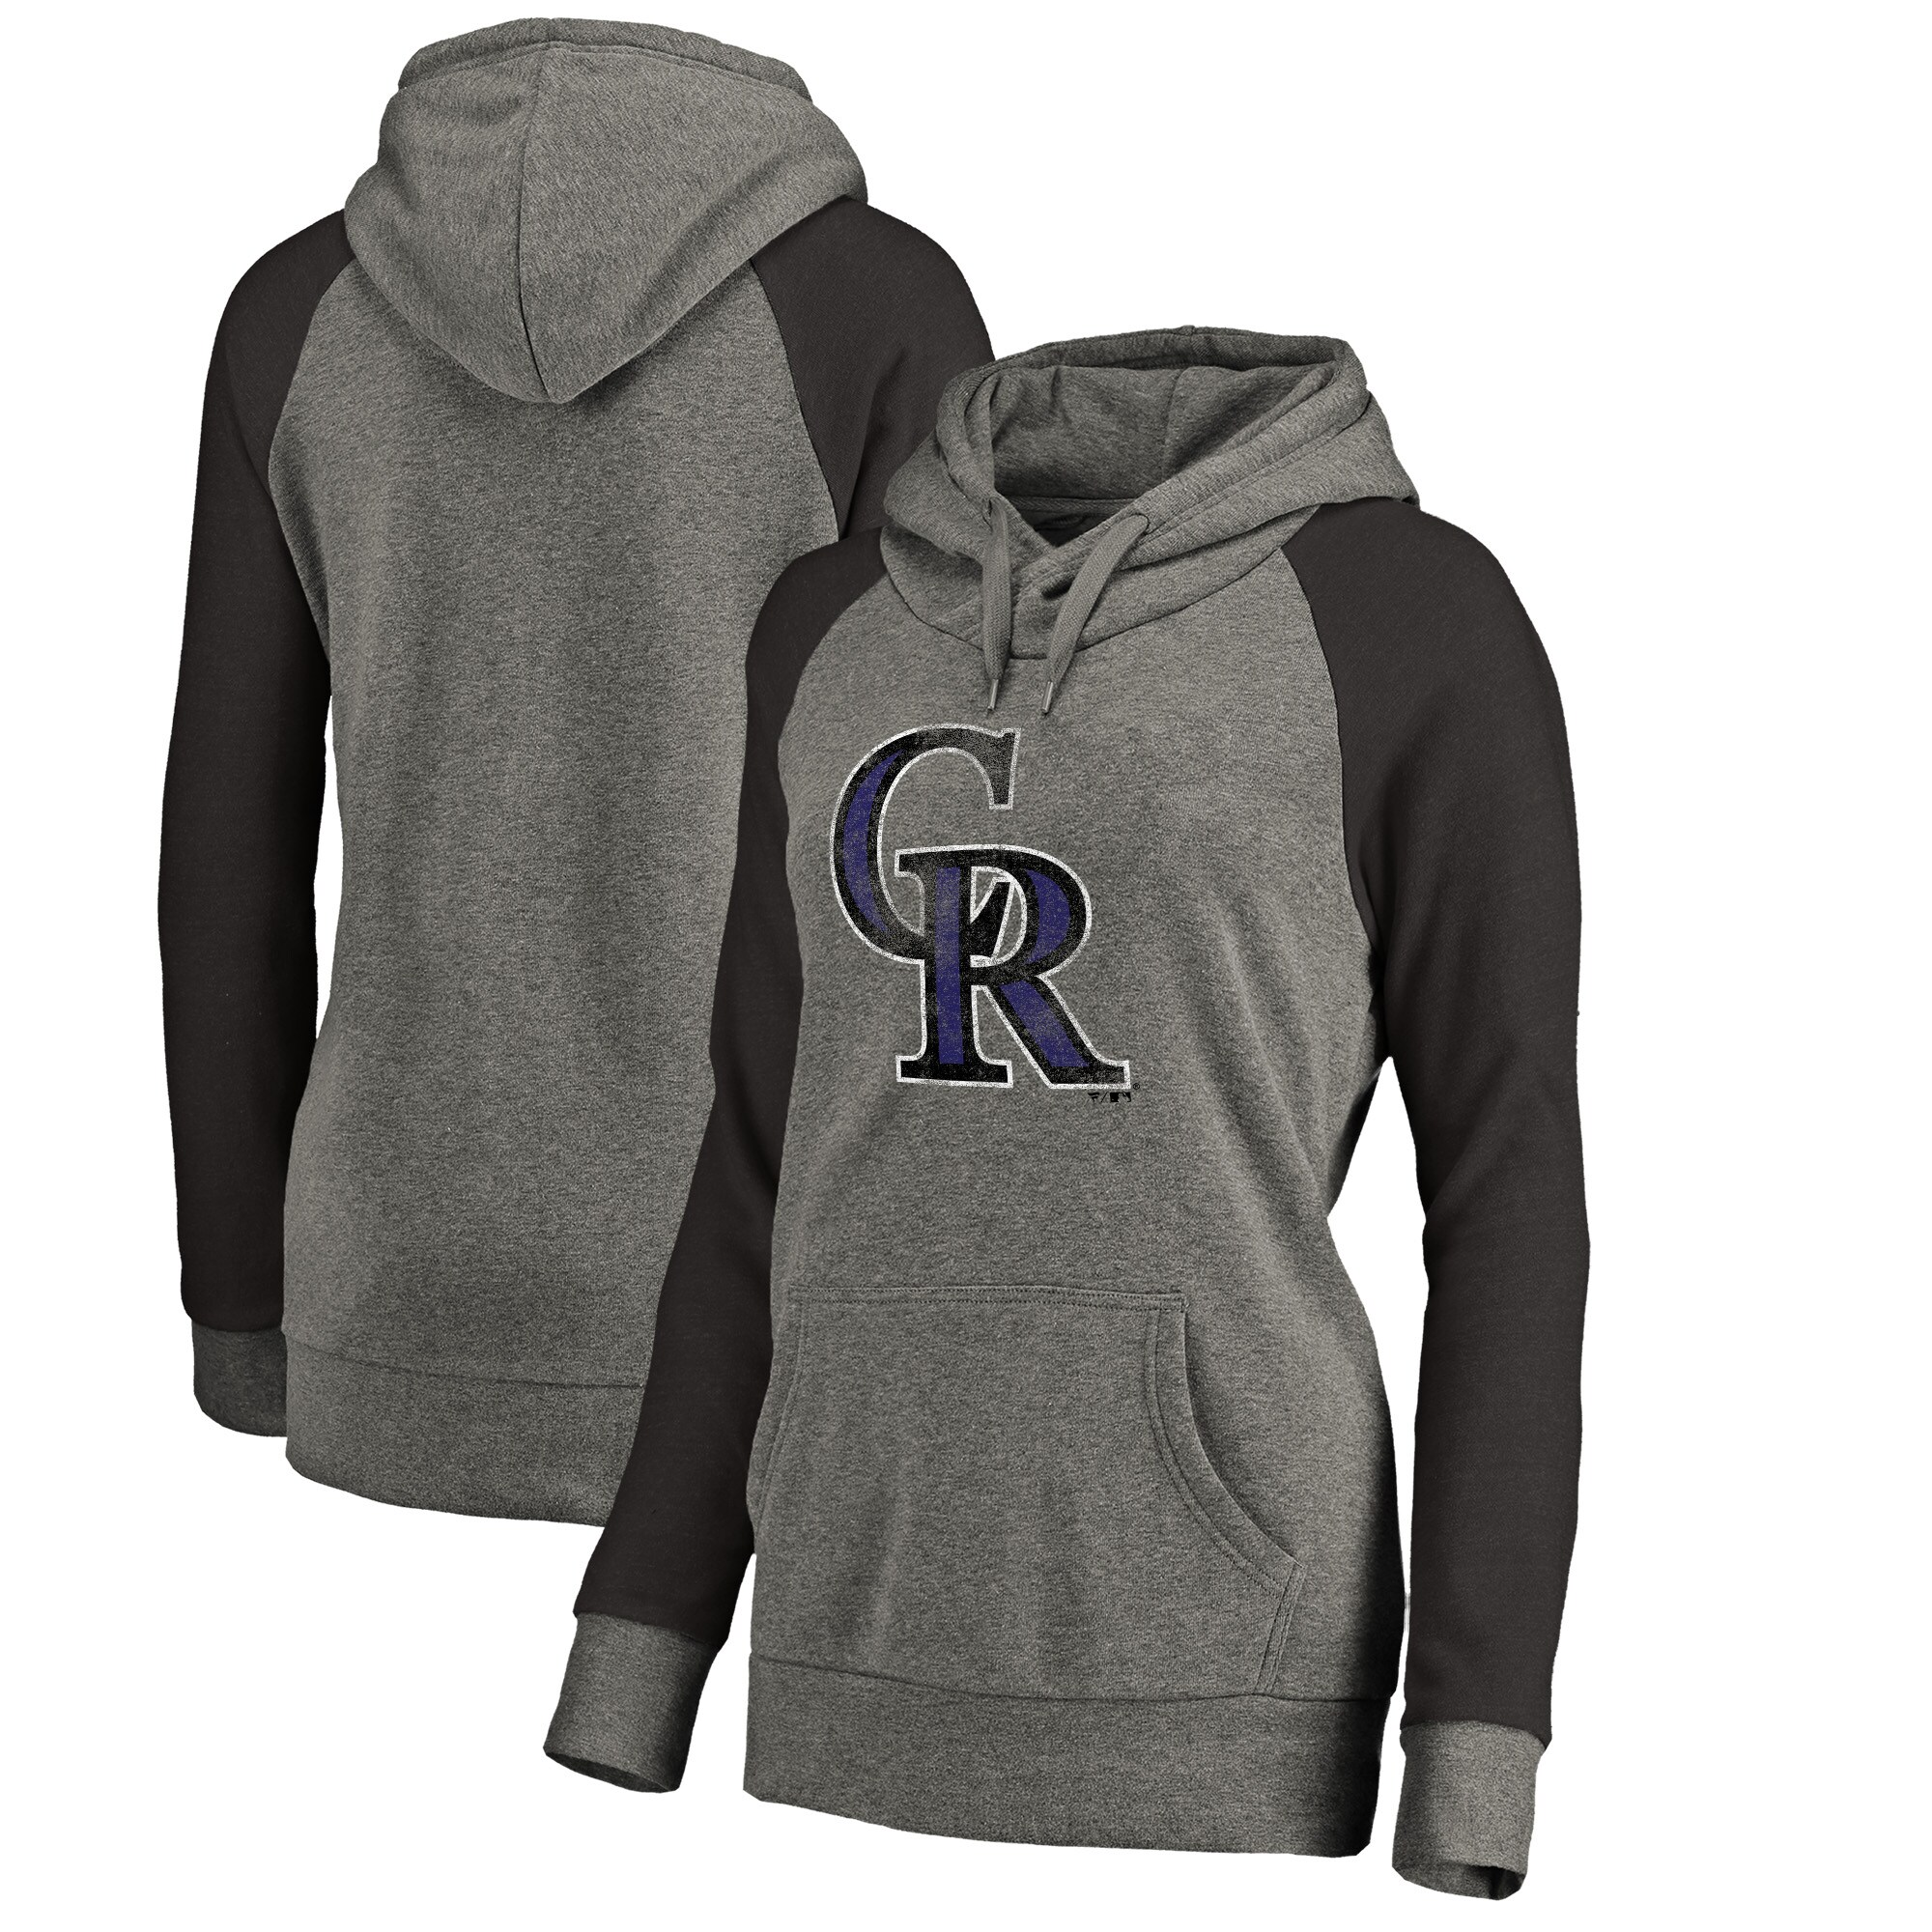 Colorado Rockies Fanatics Branded Women's Distressed Team Logo Tri-Blend Raglan Pullover Hoodie - Gray/Black